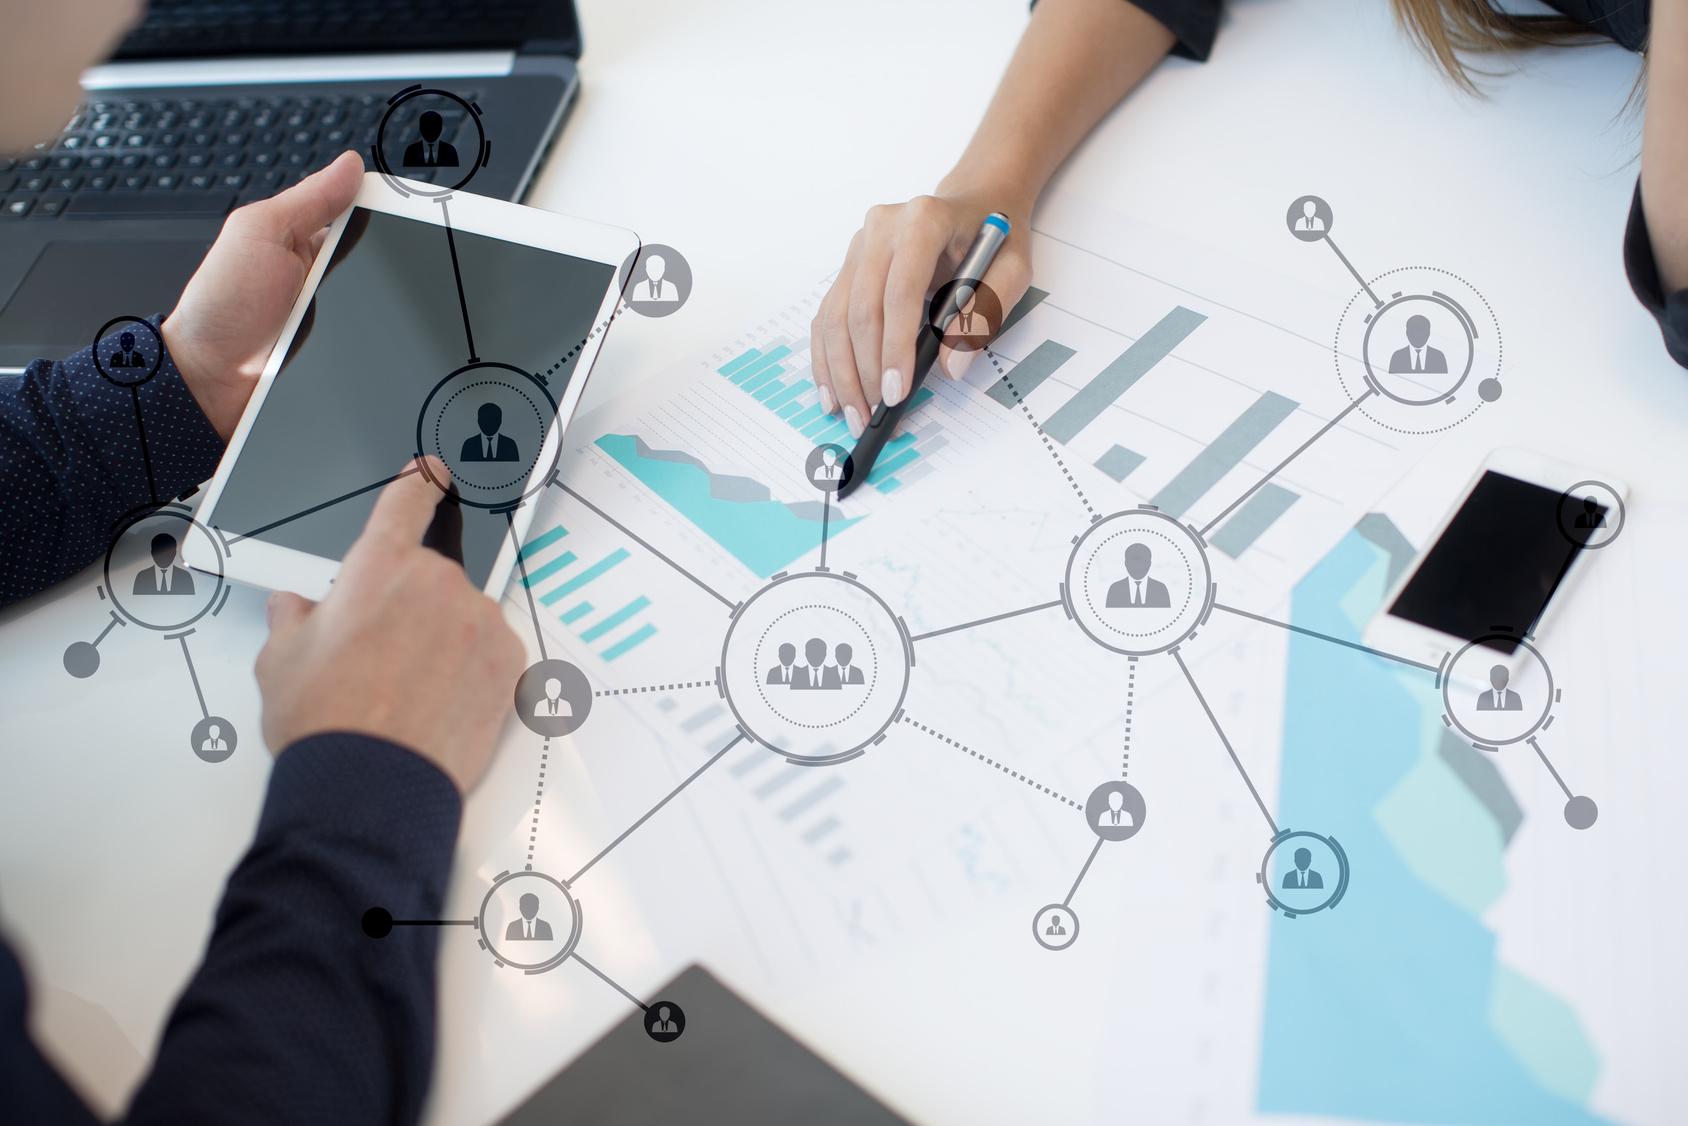 طراحی سایت پورتال سازمانی